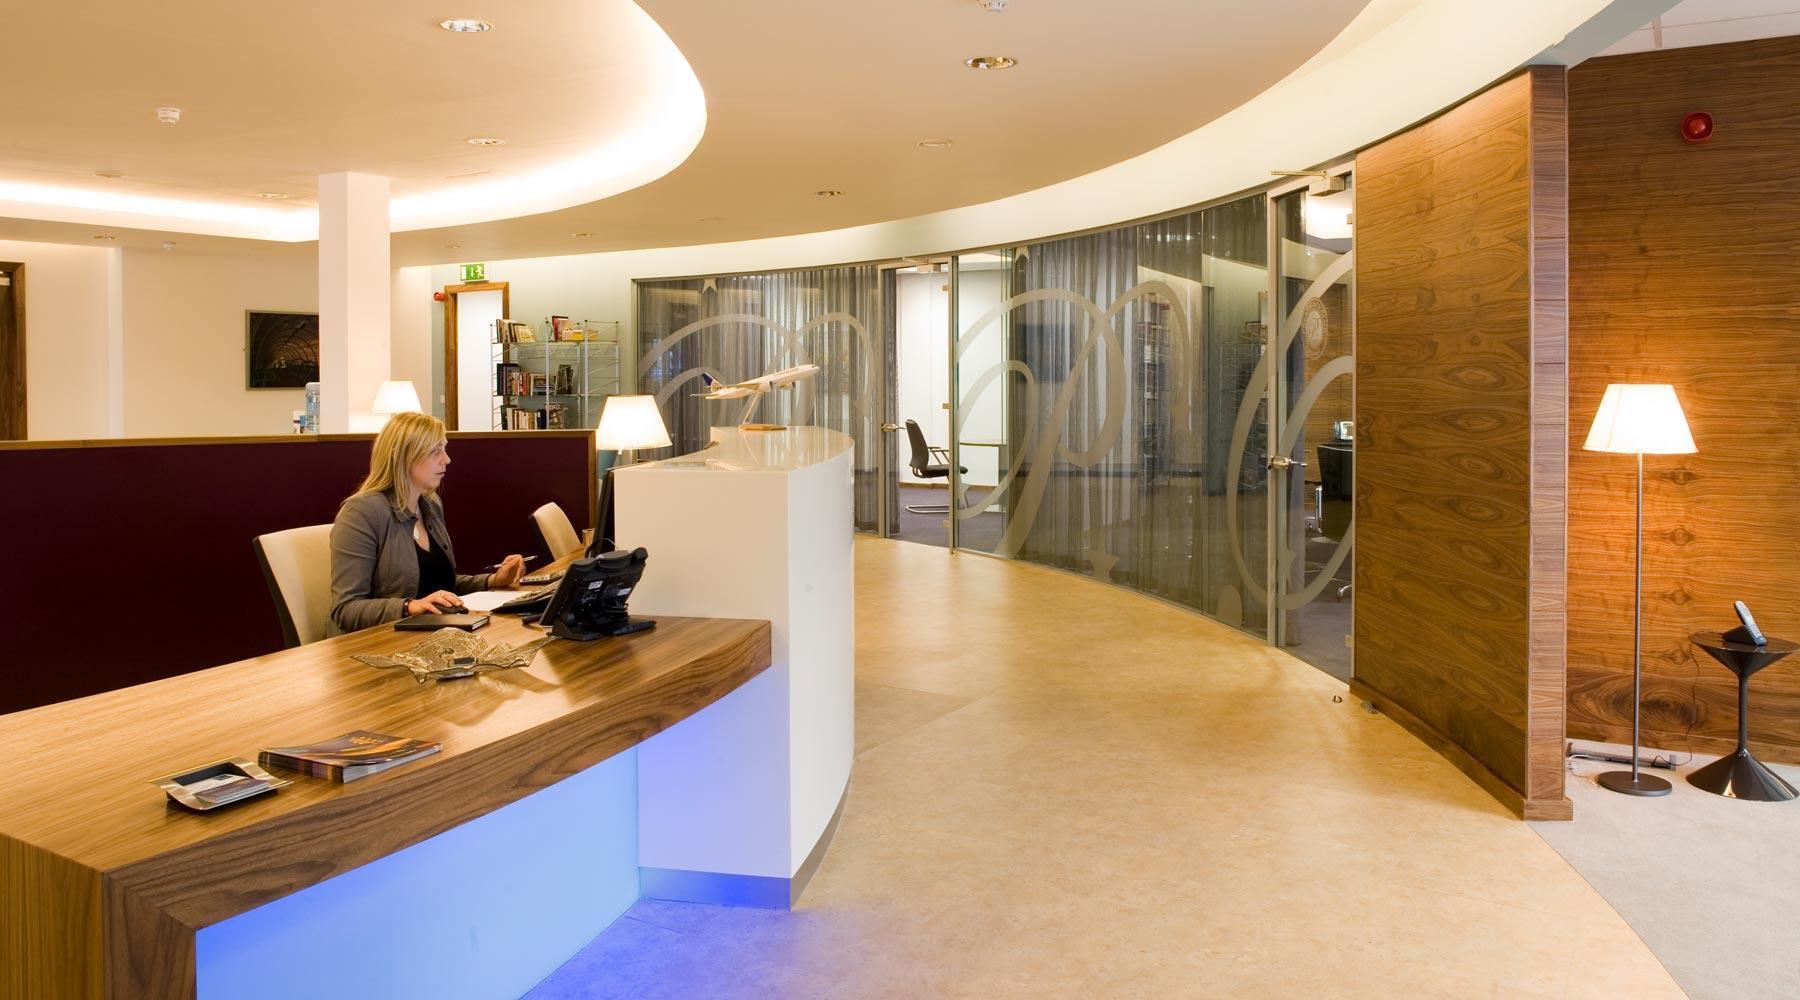 RMI Architects midtown centre Belfast